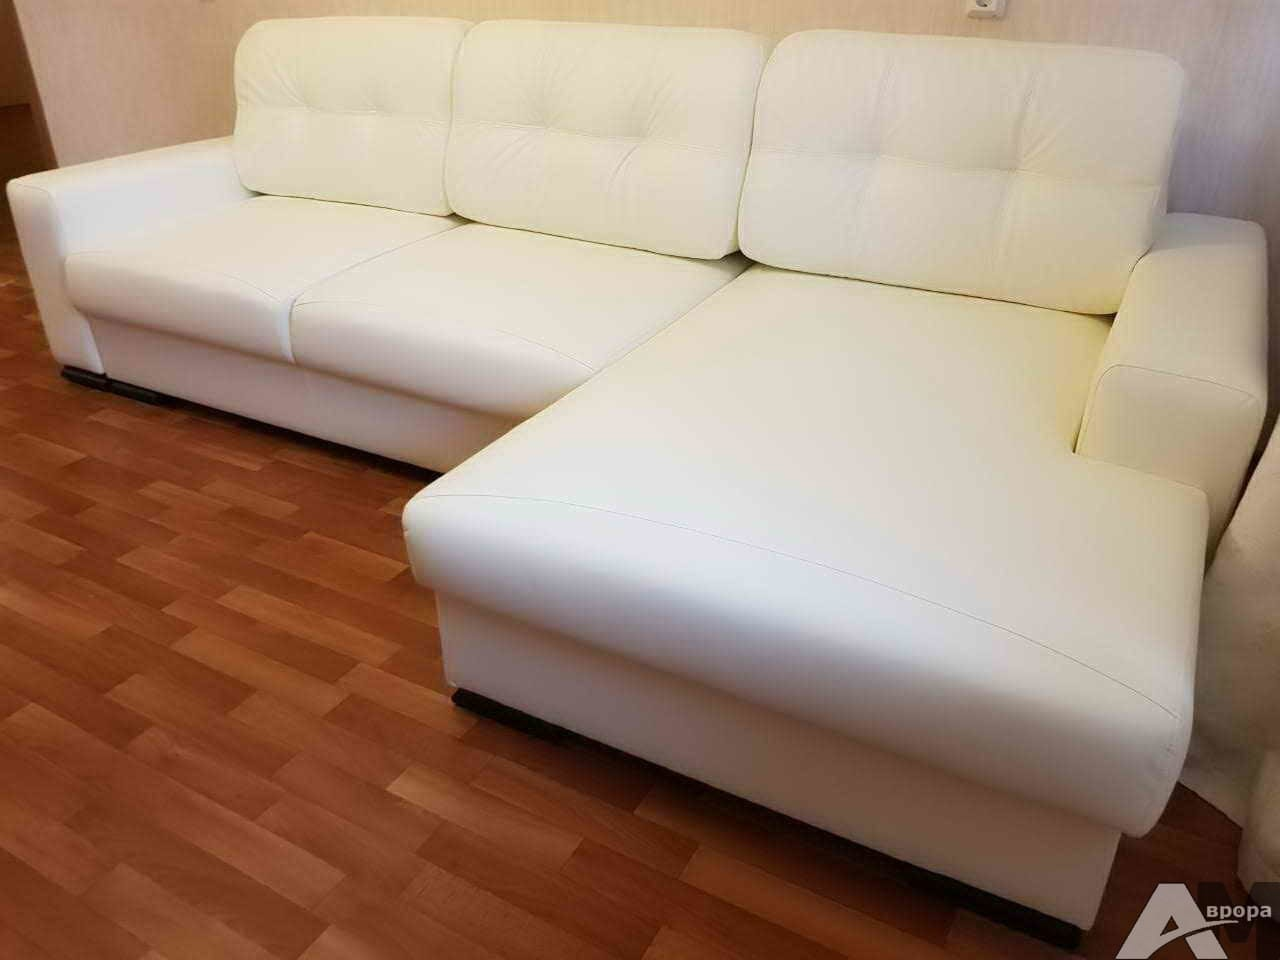 Перетяжка углового дивана в кожзам фото 14